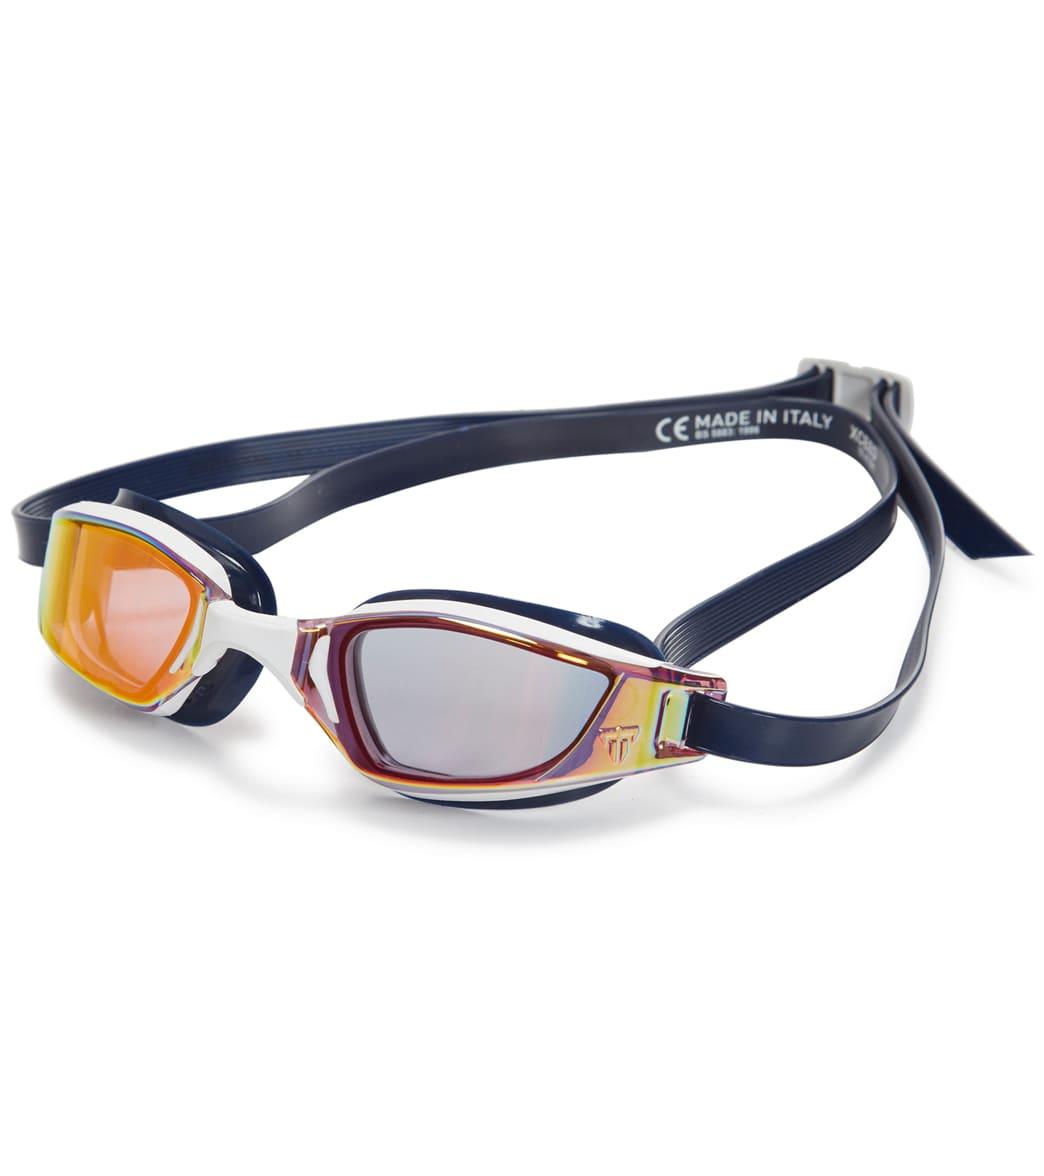 Phelps Xceed Red Titanium Mirrored Lens Swim Goggle